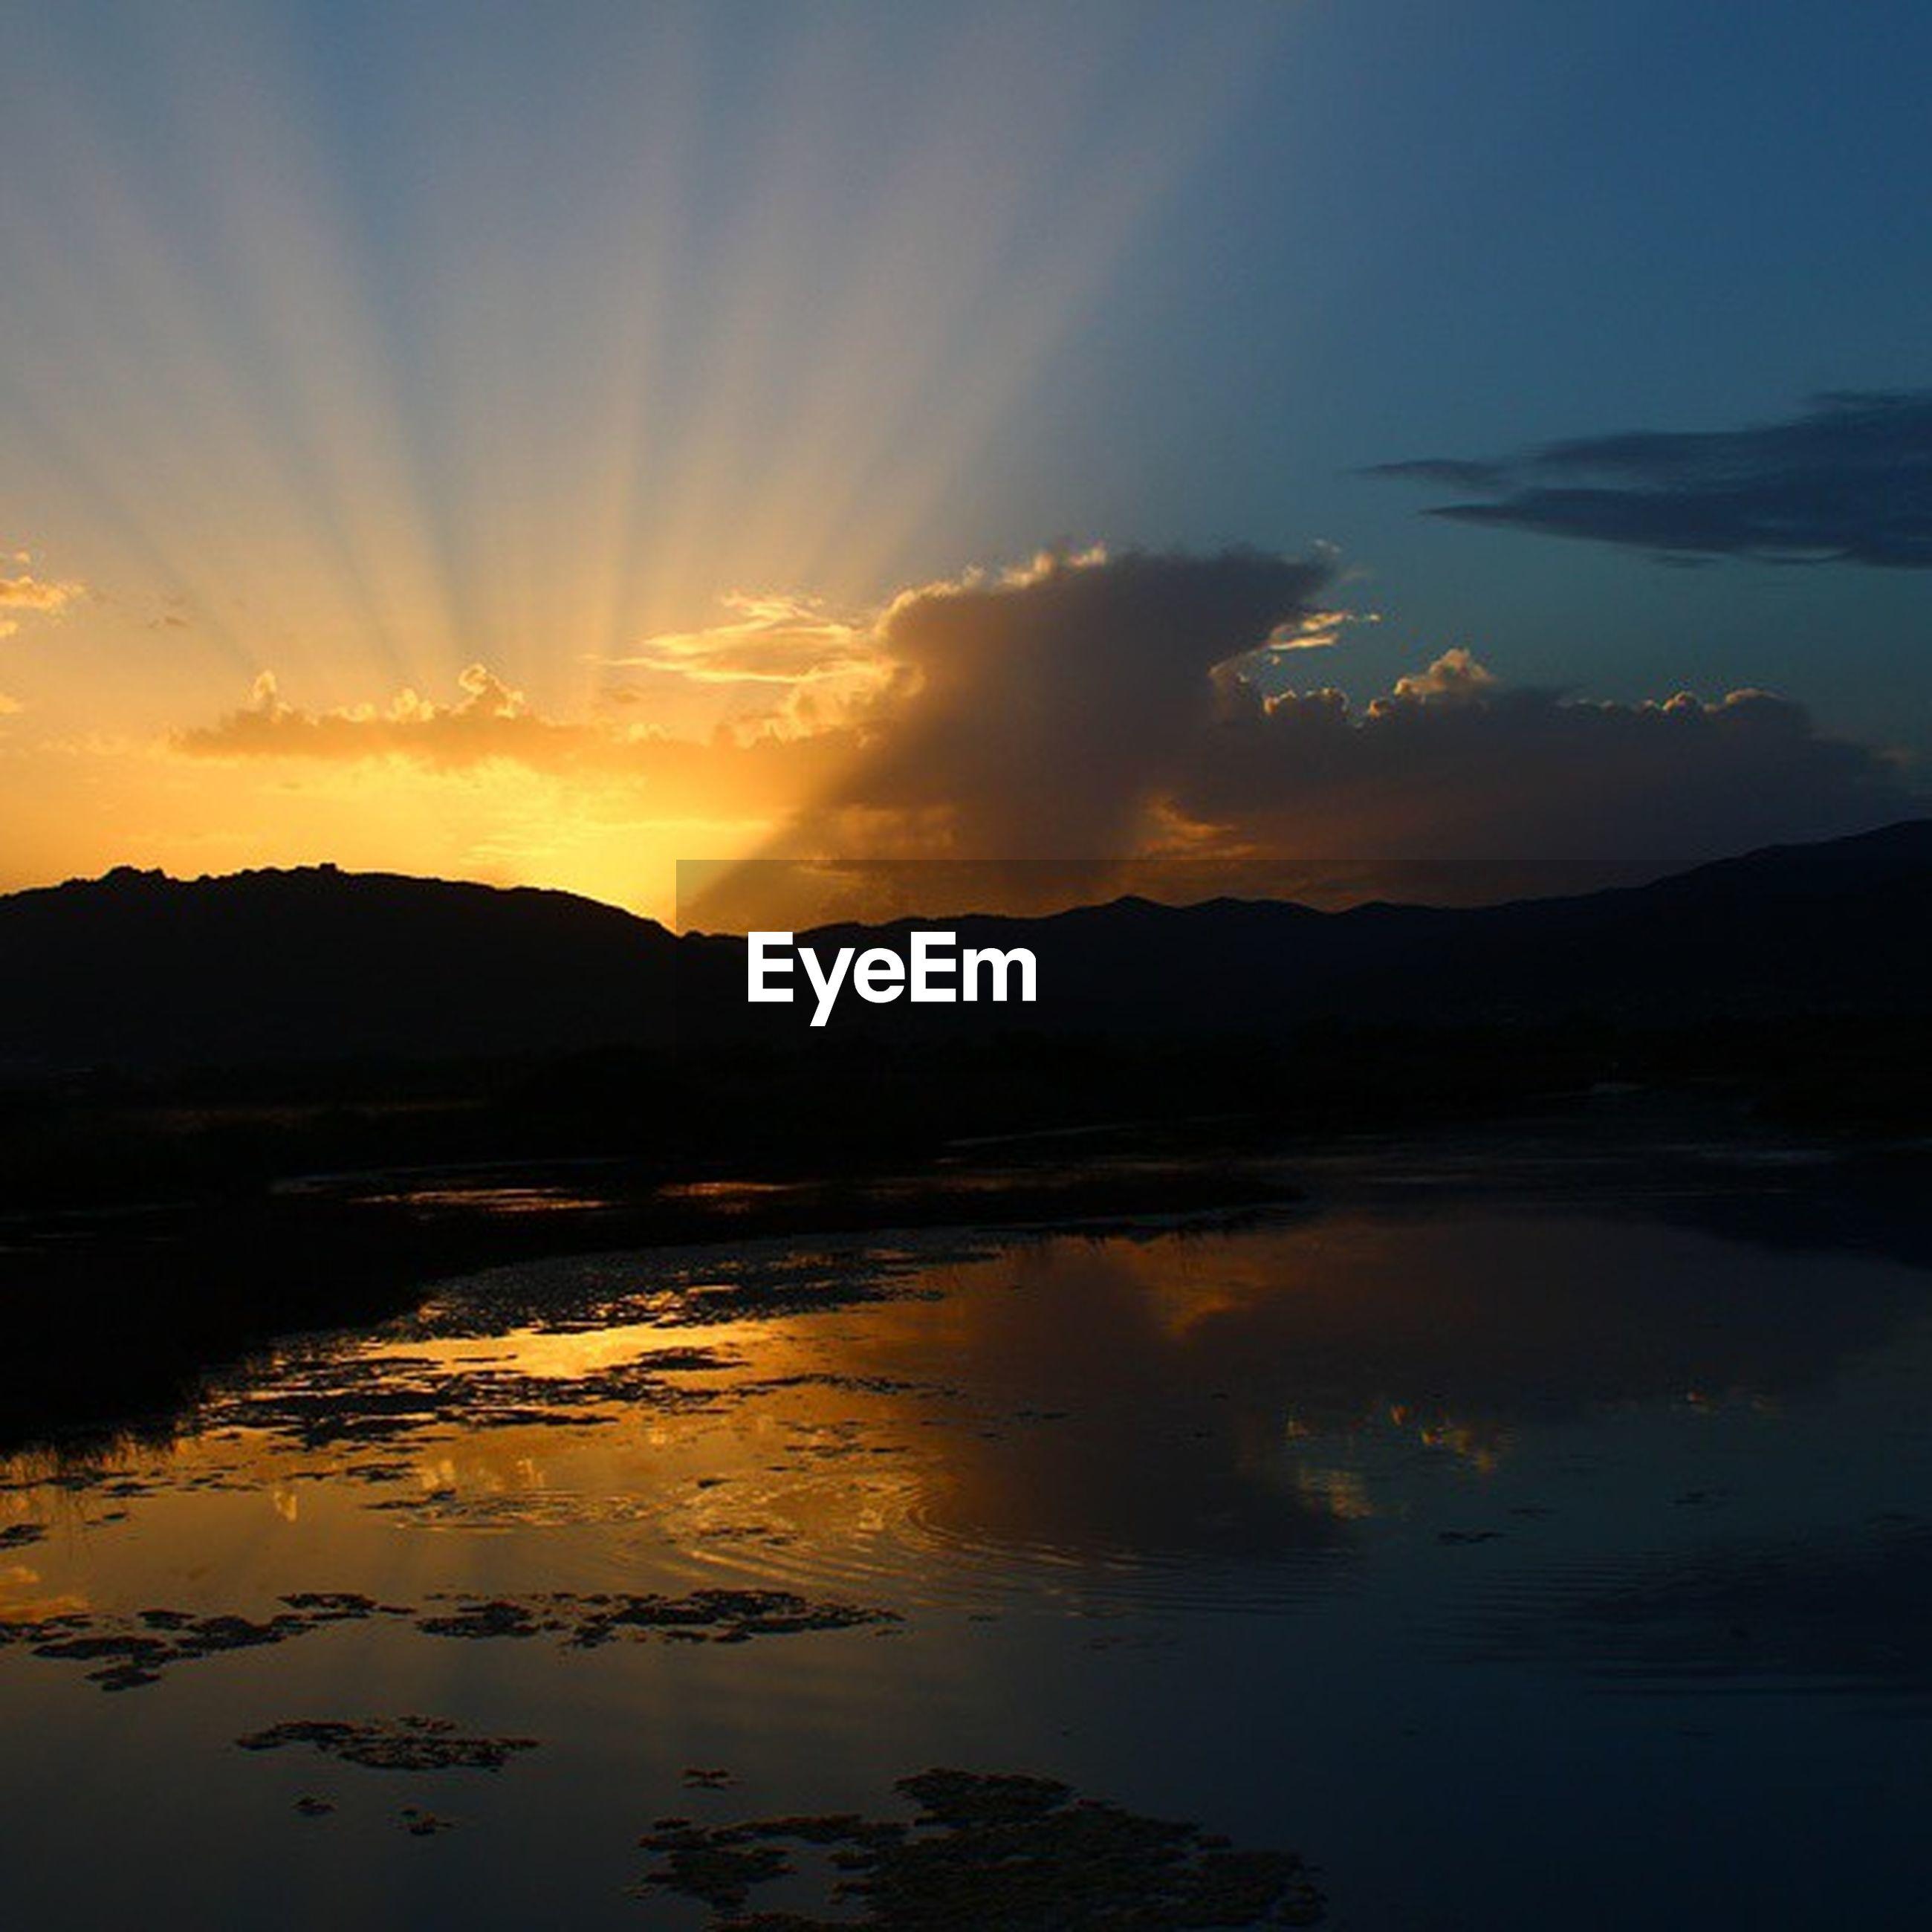 sunset, water, tranquil scene, scenics, reflection, tranquility, beauty in nature, silhouette, lake, sky, mountain, idyllic, nature, orange color, sun, cloud - sky, calm, majestic, sunlight, non-urban scene